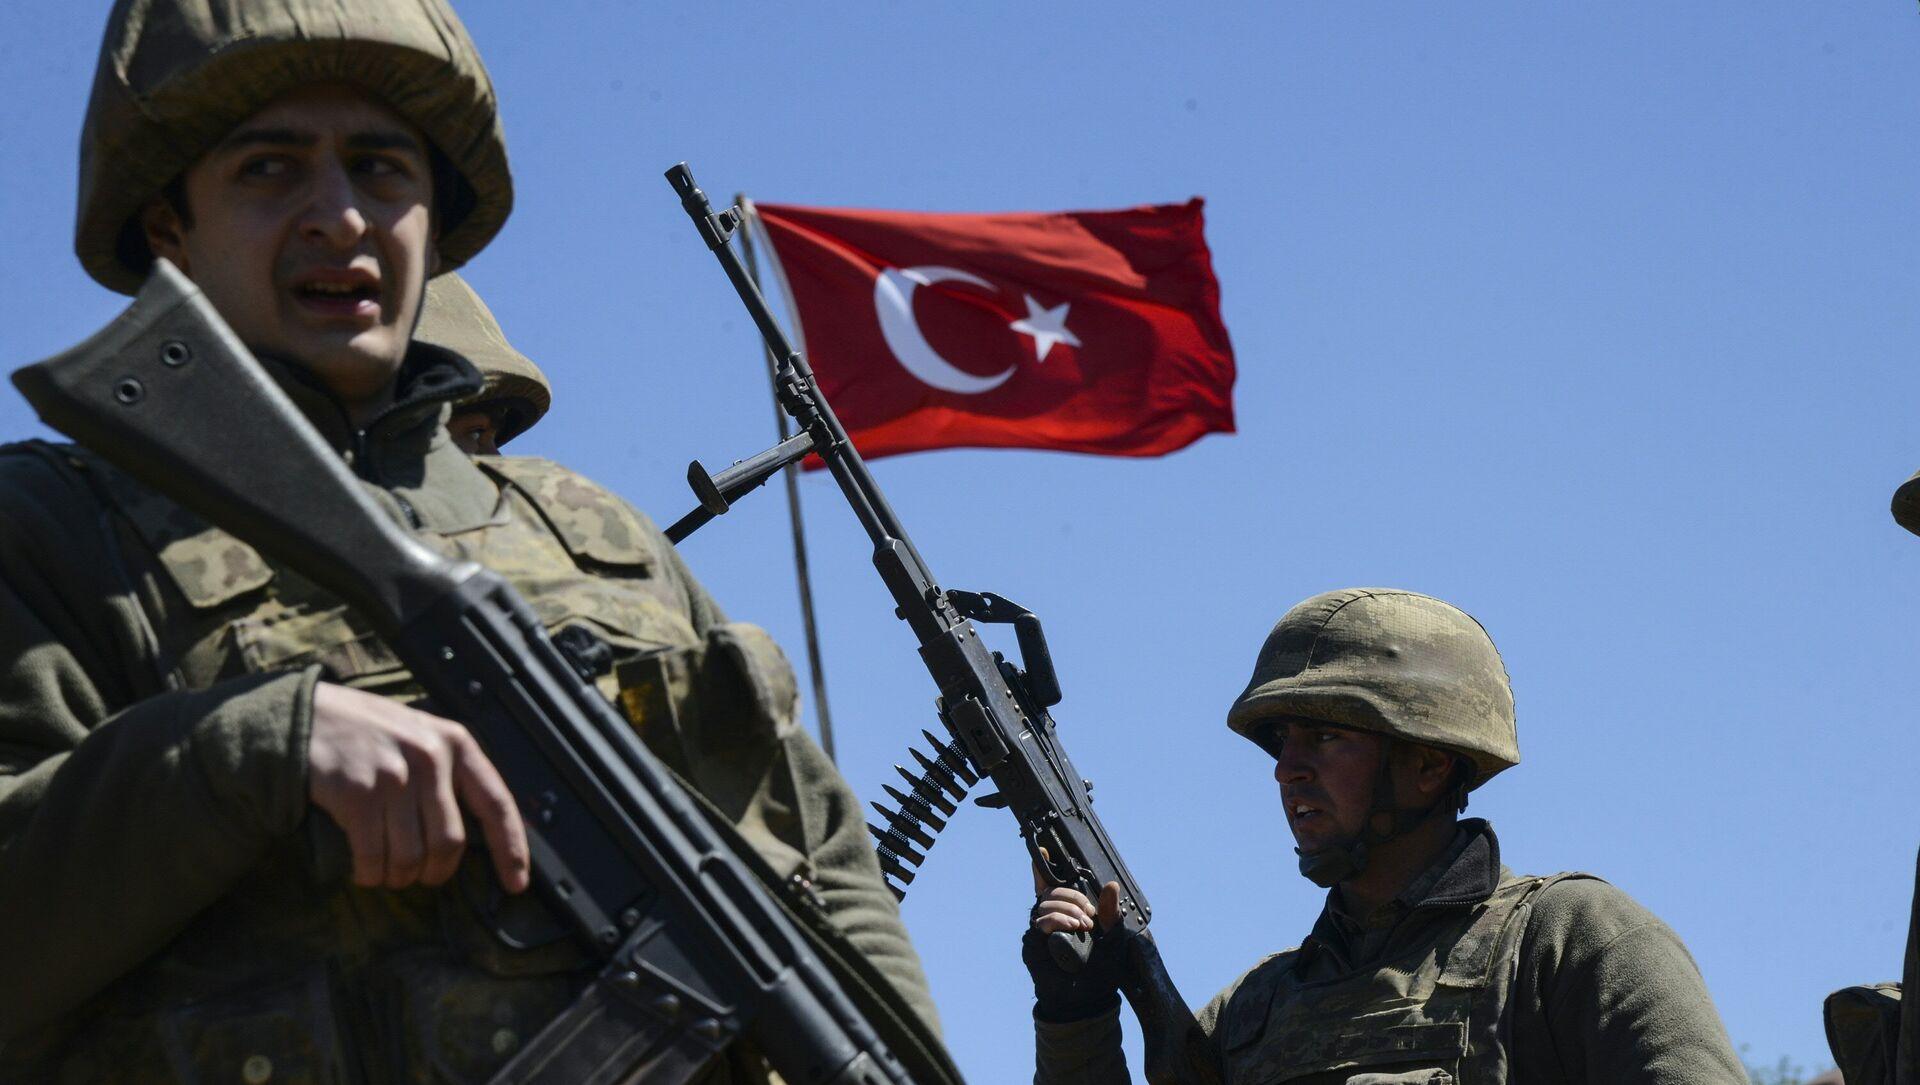 Turkish army soldiers - Sputnik International, 1920, 29.07.2021